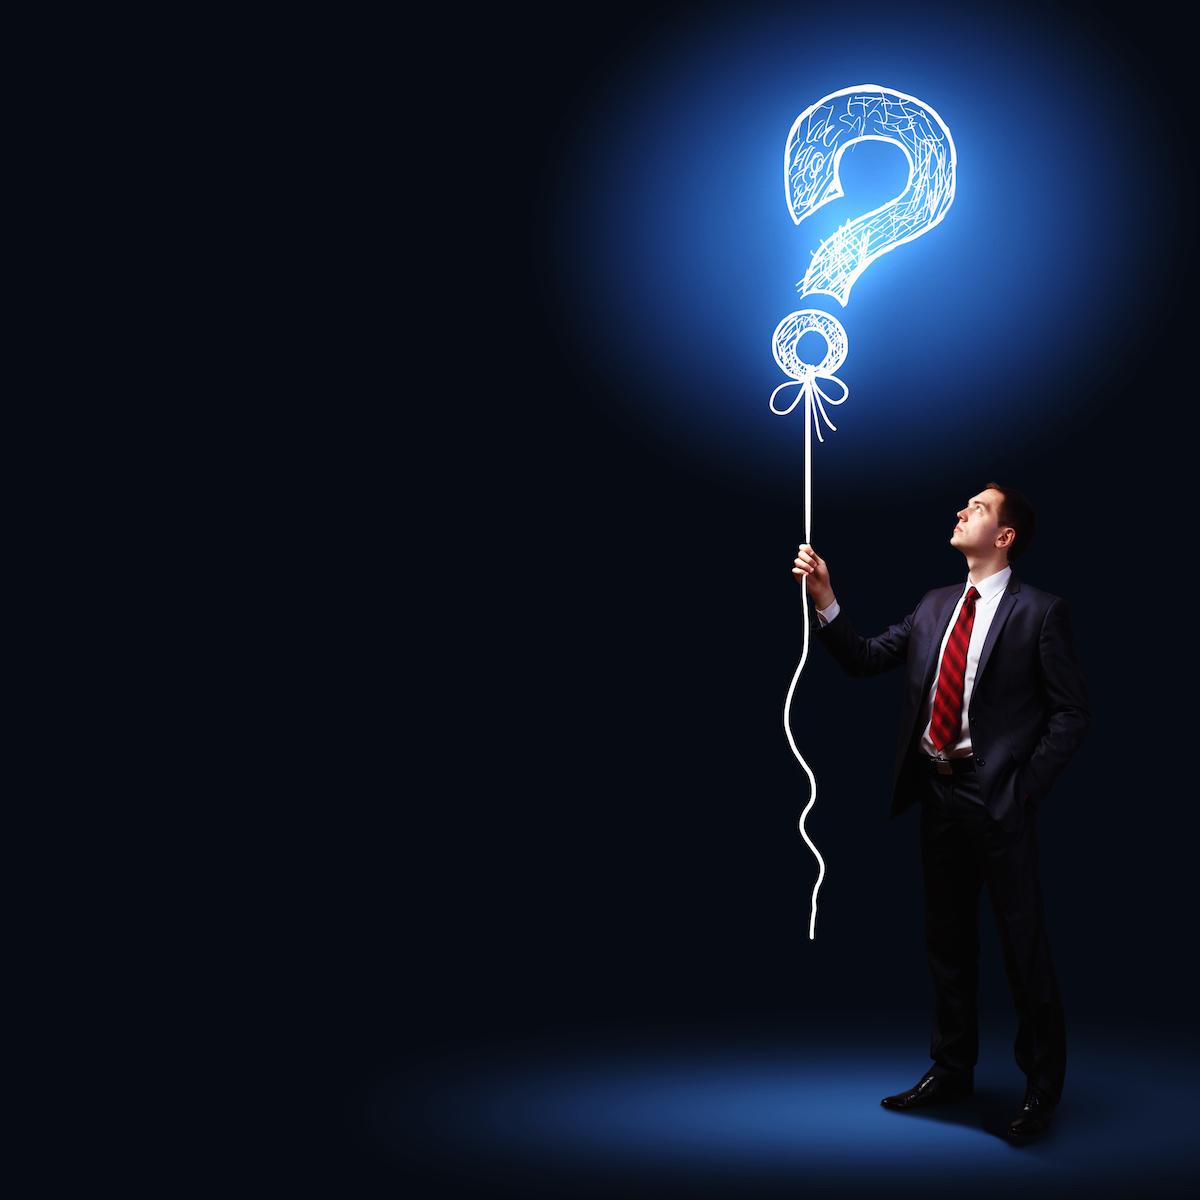 Critical thinking via questions